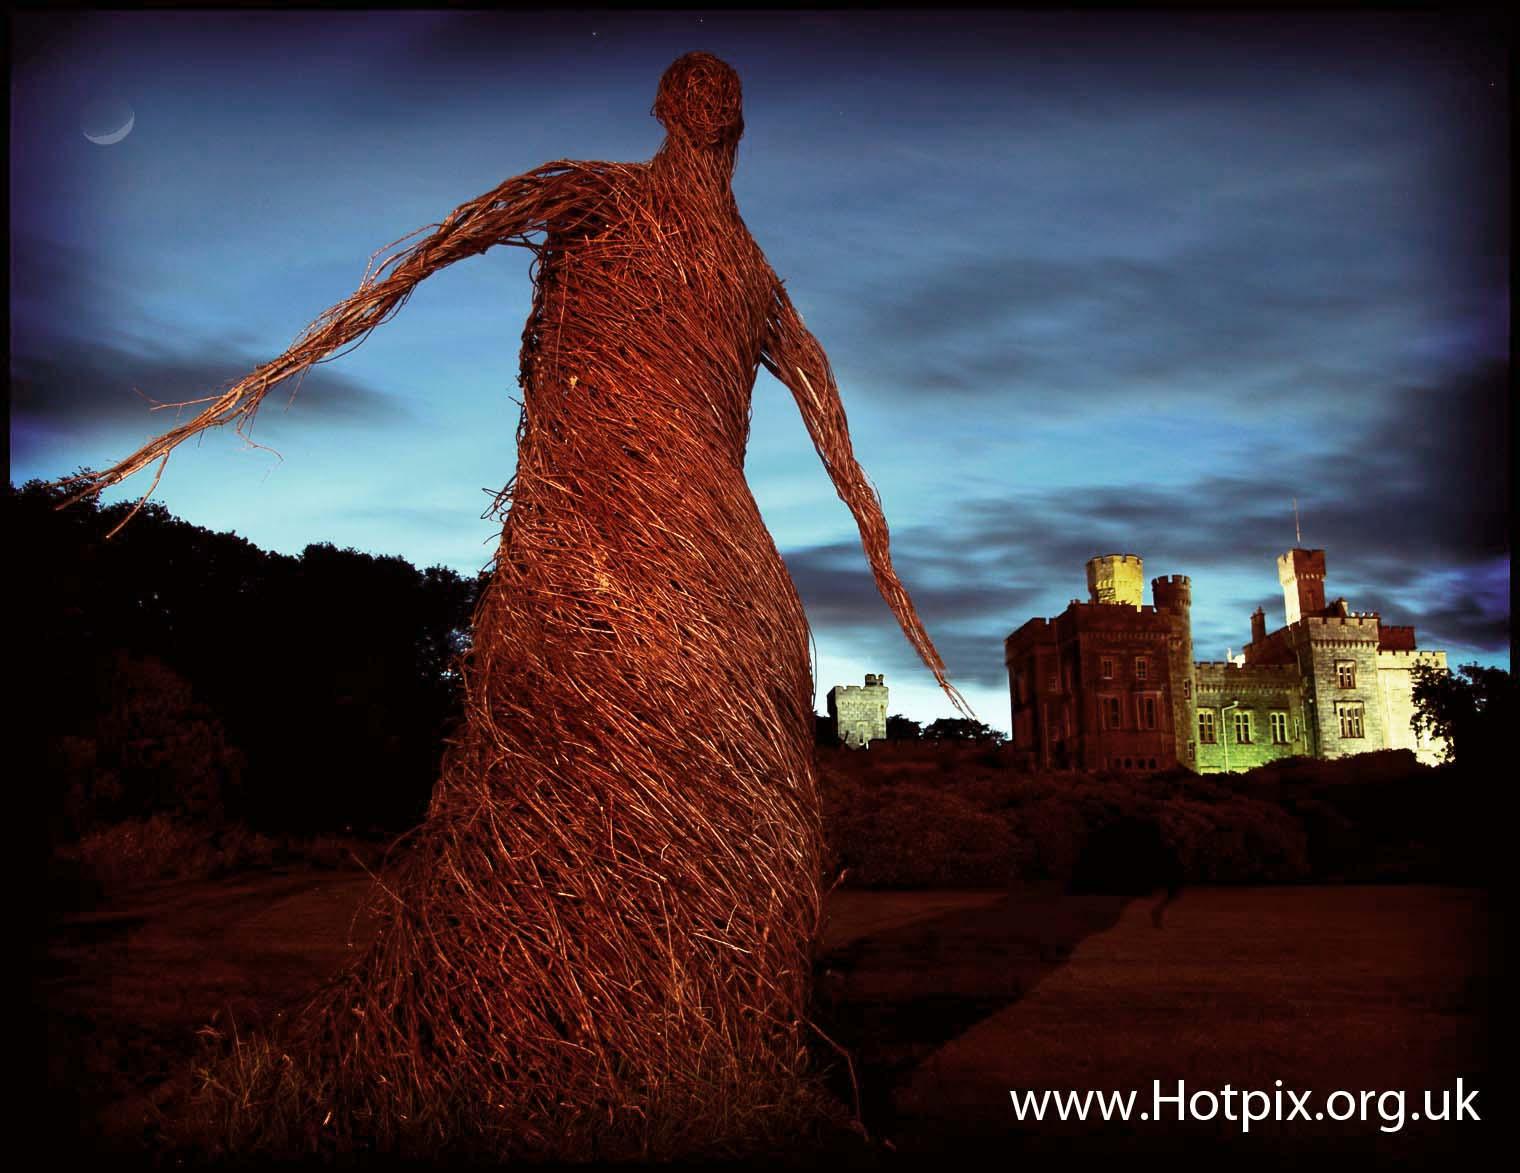 bluehour,blue,hour,dusk,Scotland,Stornoway,western,isles,Lewis,Harris,UK,GB,great,britain,castle,moon,grounds,wicker,art,woman,tony,smith,hotpix,tonysmithhotpix,tonysmith,CNES,Hebrides,painting,with,light,long,exposure,tripod,HDR